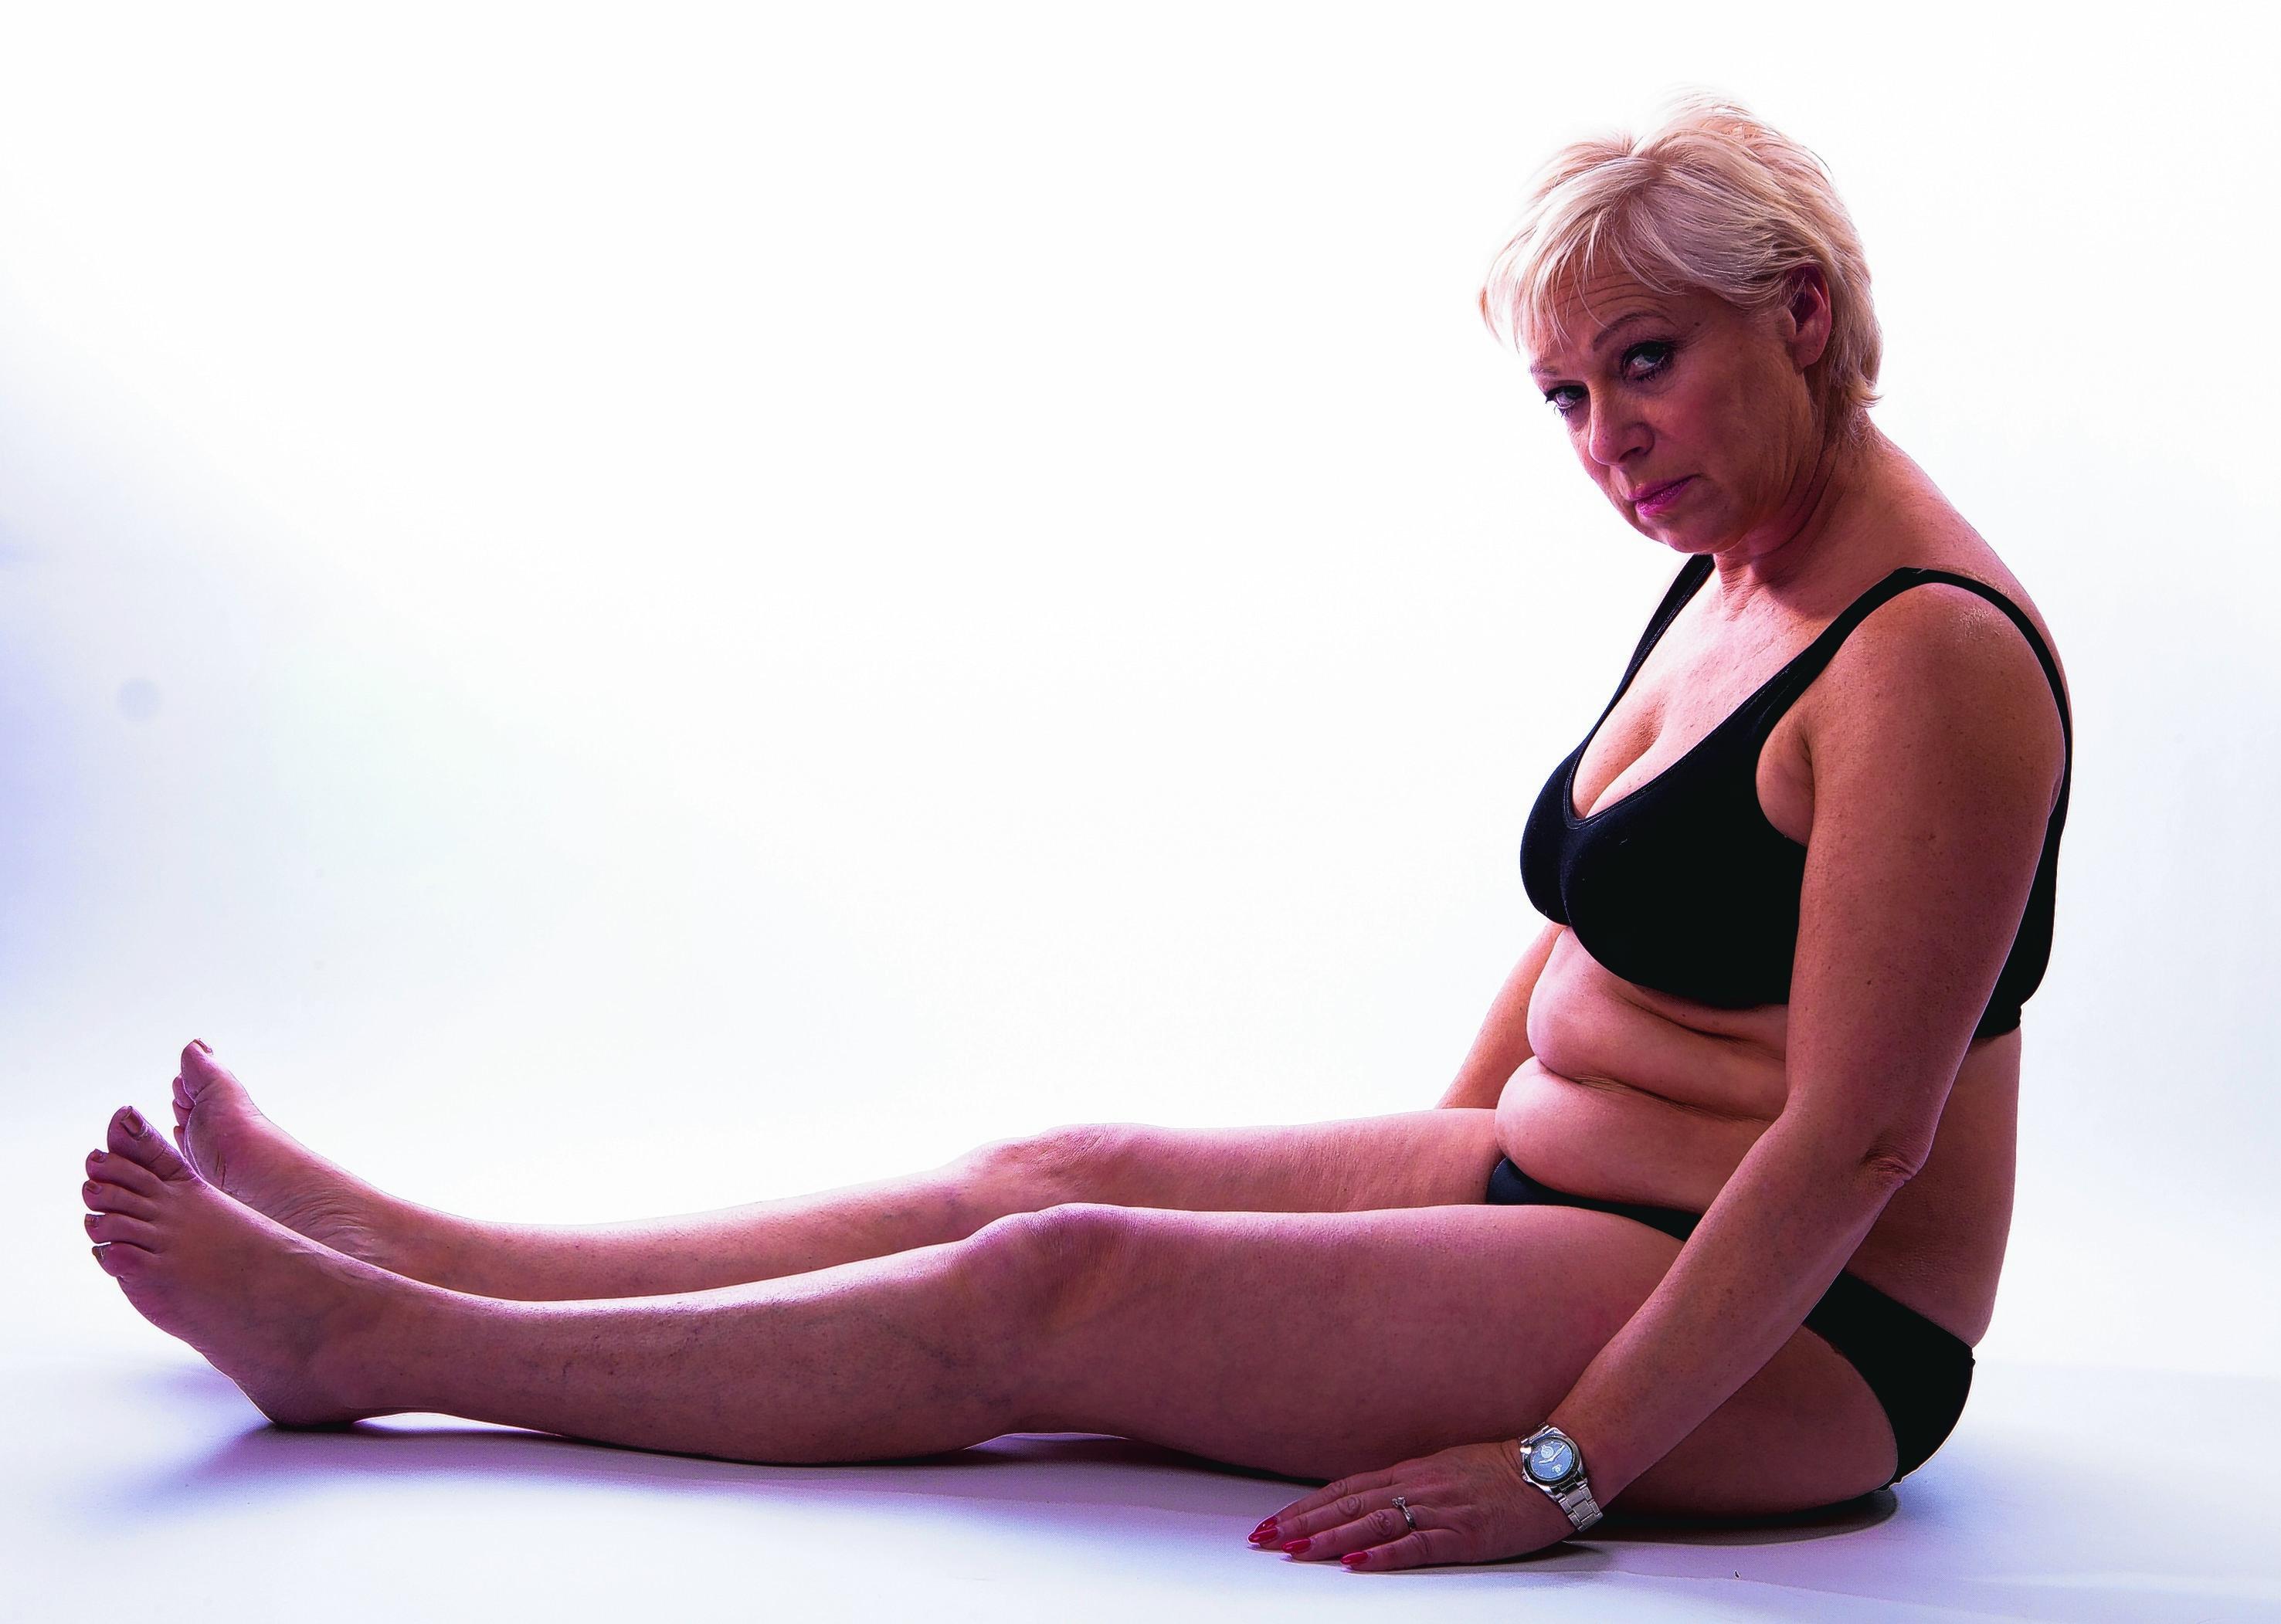 Denise Welch before her diet